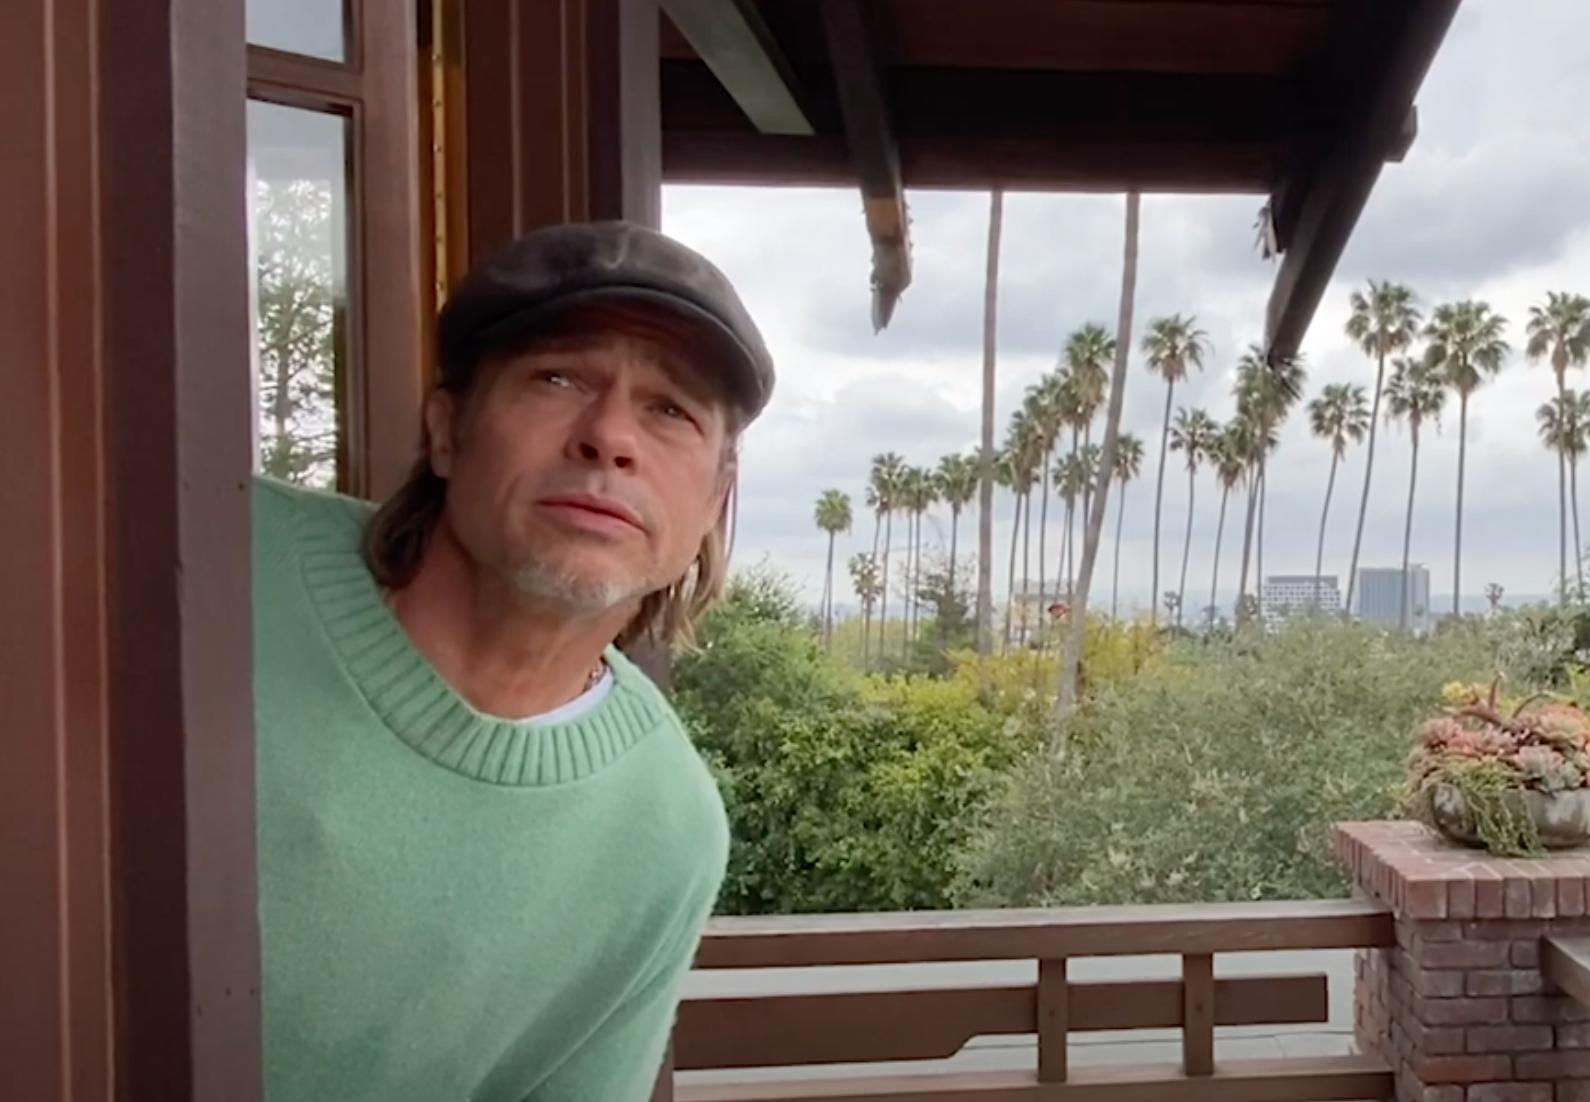 Brad Pitt Has Funny Cameo As Weatherman In John Krasinski's Latest 'Some Good News' Episode